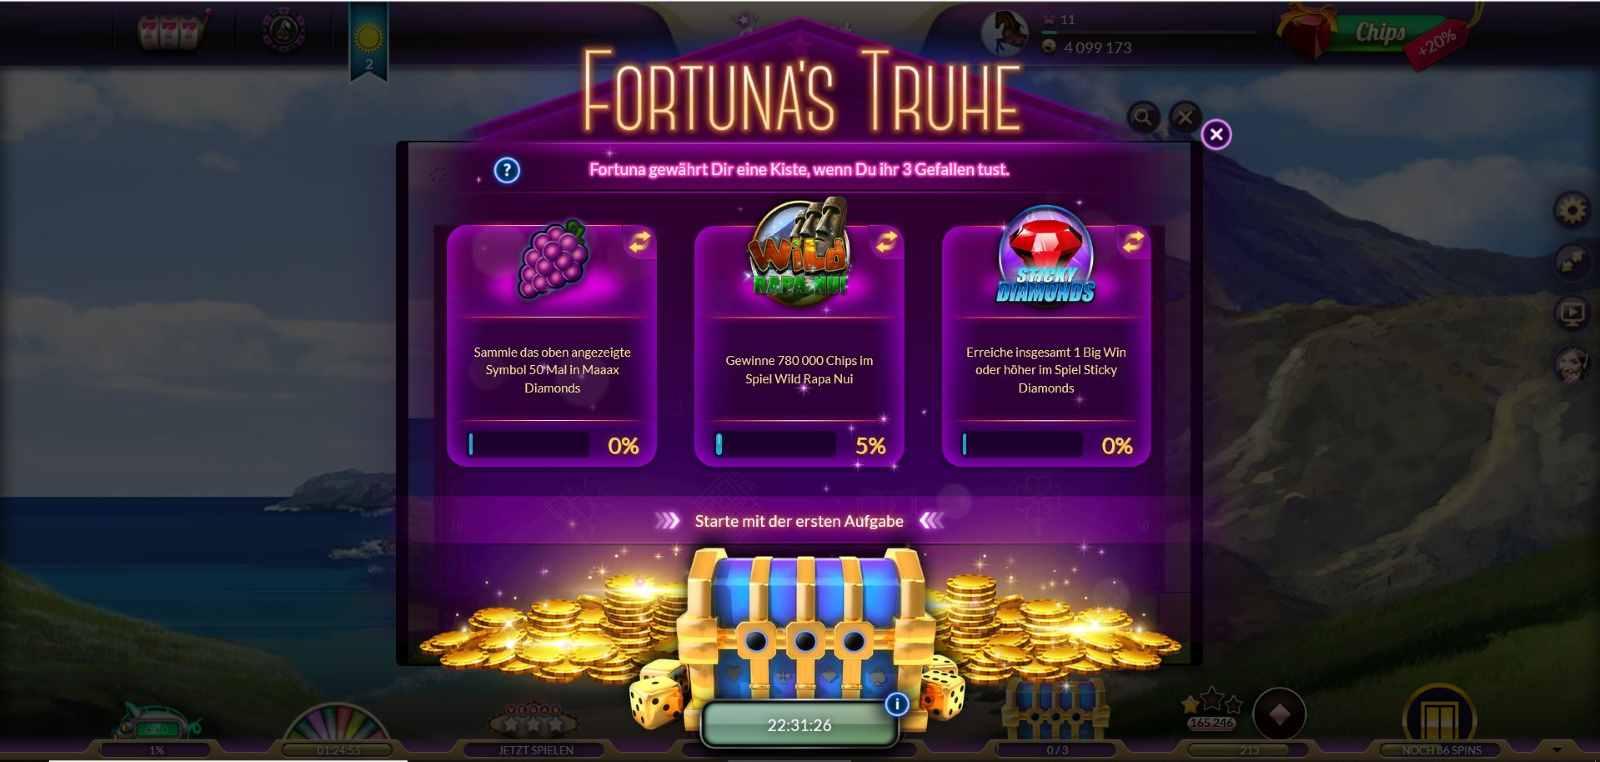 jackpot.de Fortunas Truhe